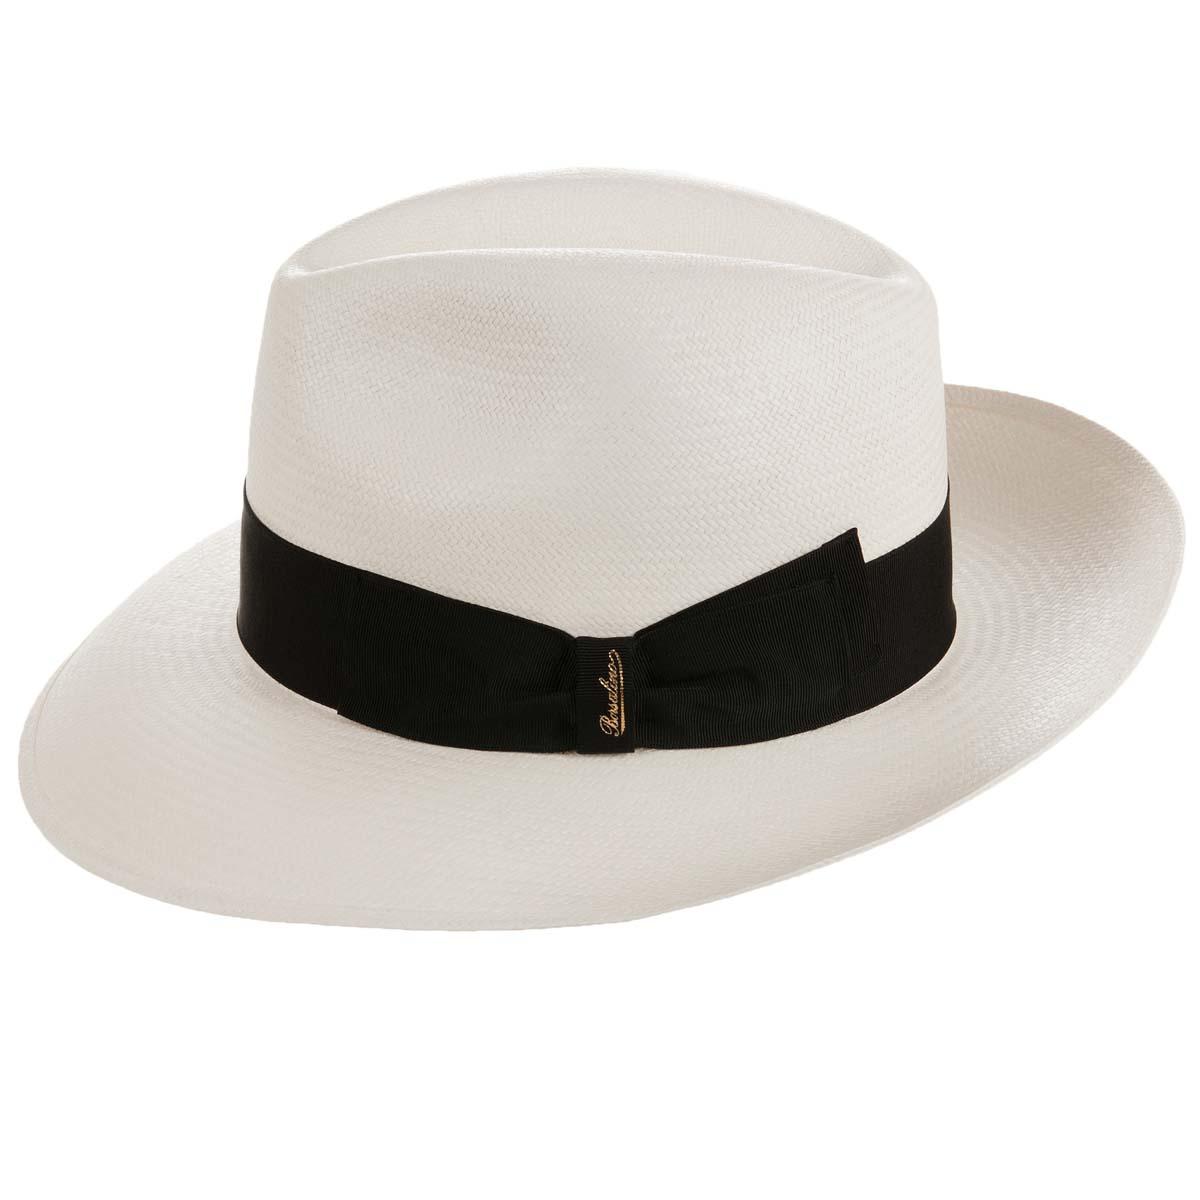 Cappello Panama a tesa larga firmato BORSALINO ... 37f1c73c2b09